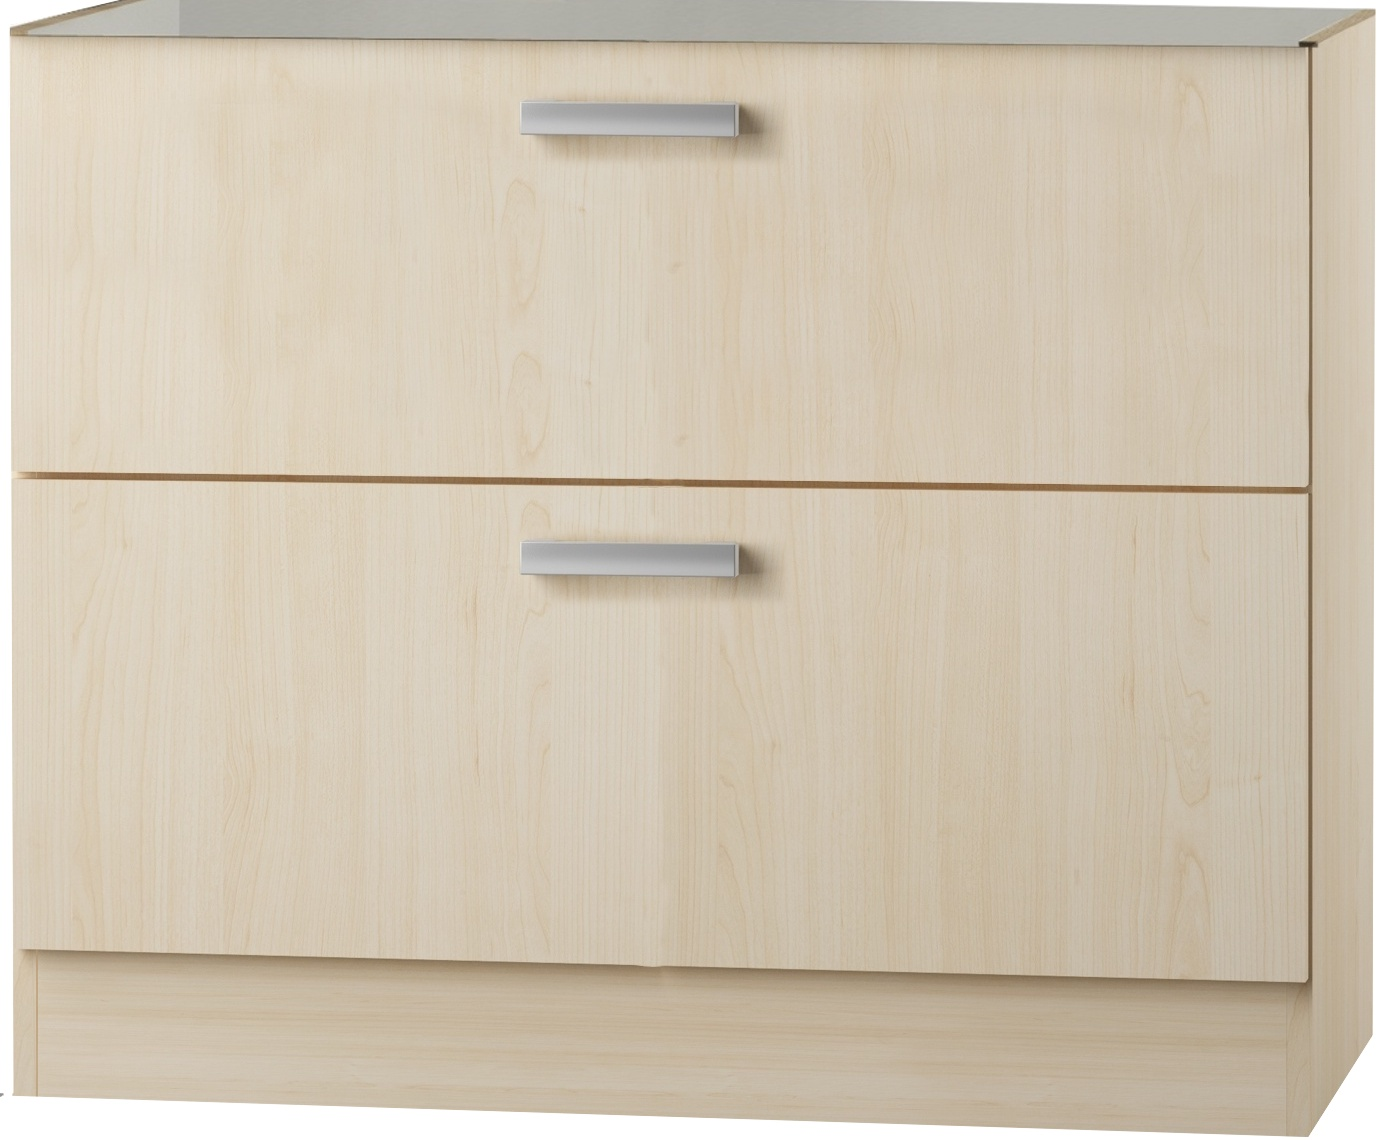 kult cordoba unterschrank 100 cm breit birke uo126 ebay. Black Bedroom Furniture Sets. Home Design Ideas